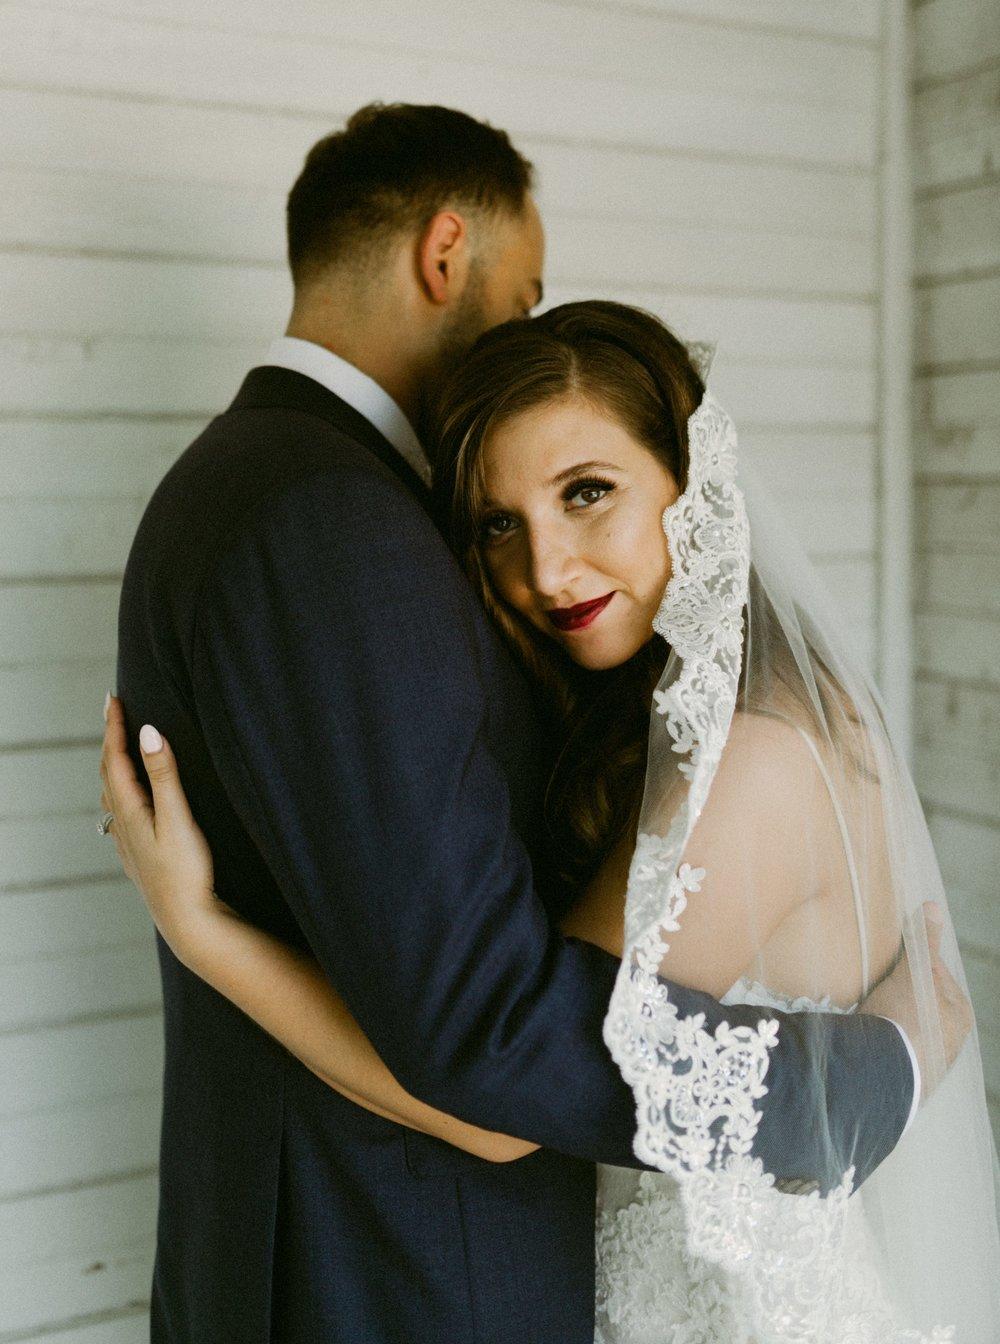 DanielaKamal_WEDDING_DOCTORSHOUSE_bisouseventsYAS-361ASE.jpg